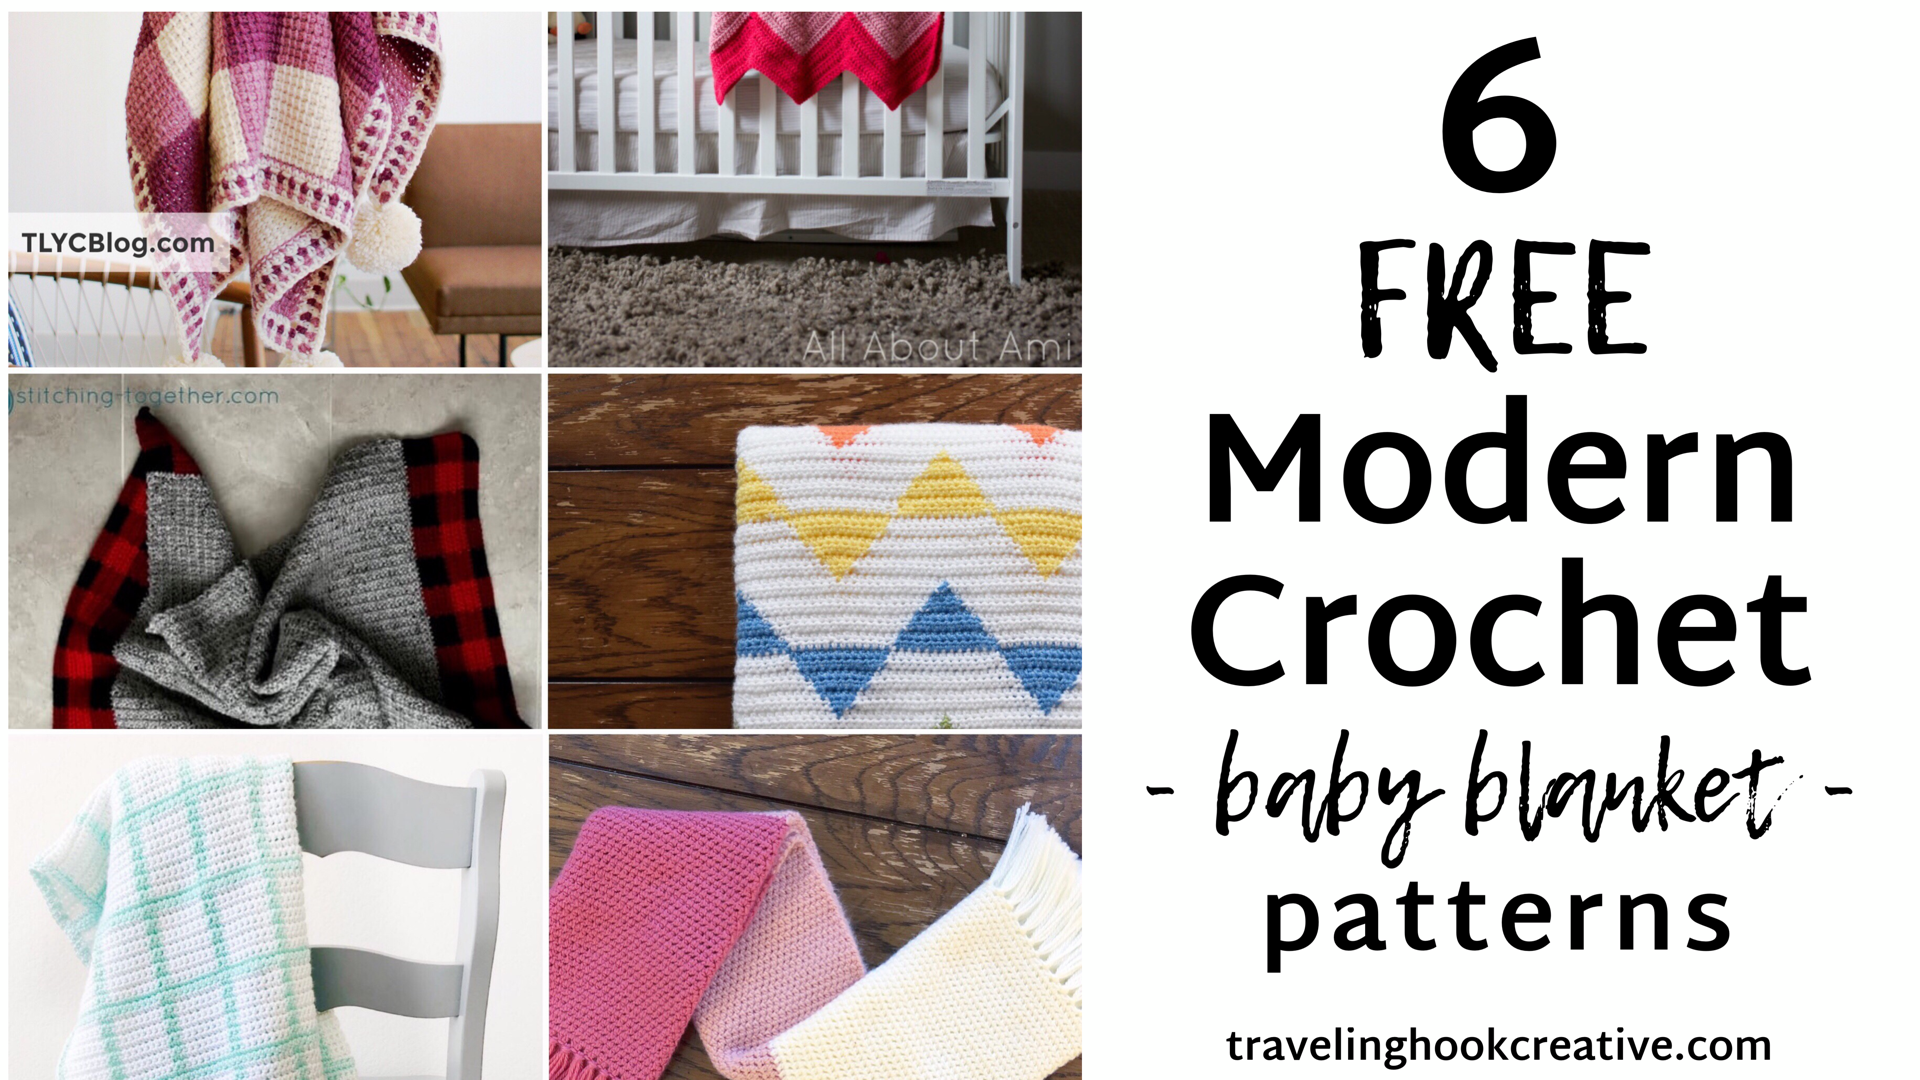 6 Free Modern Crochet Baby Blankets Traveling Hook Creative